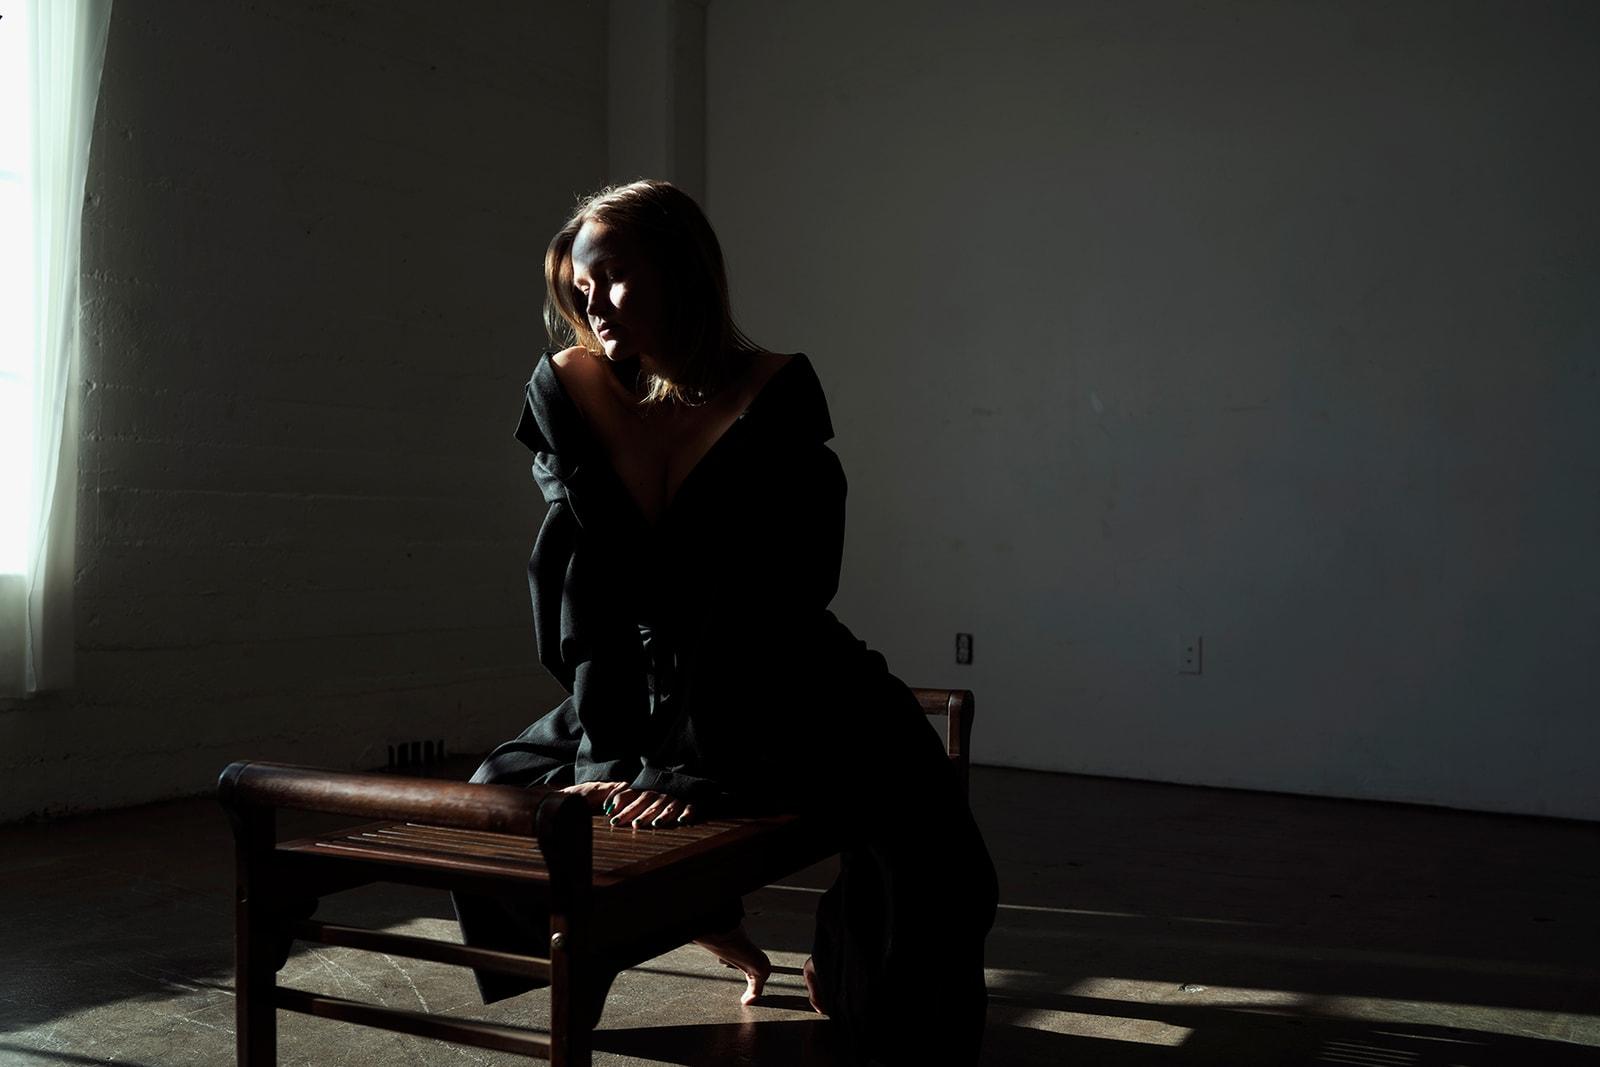 Sasha Samsonova Kylie Jenners Photographer director gallant